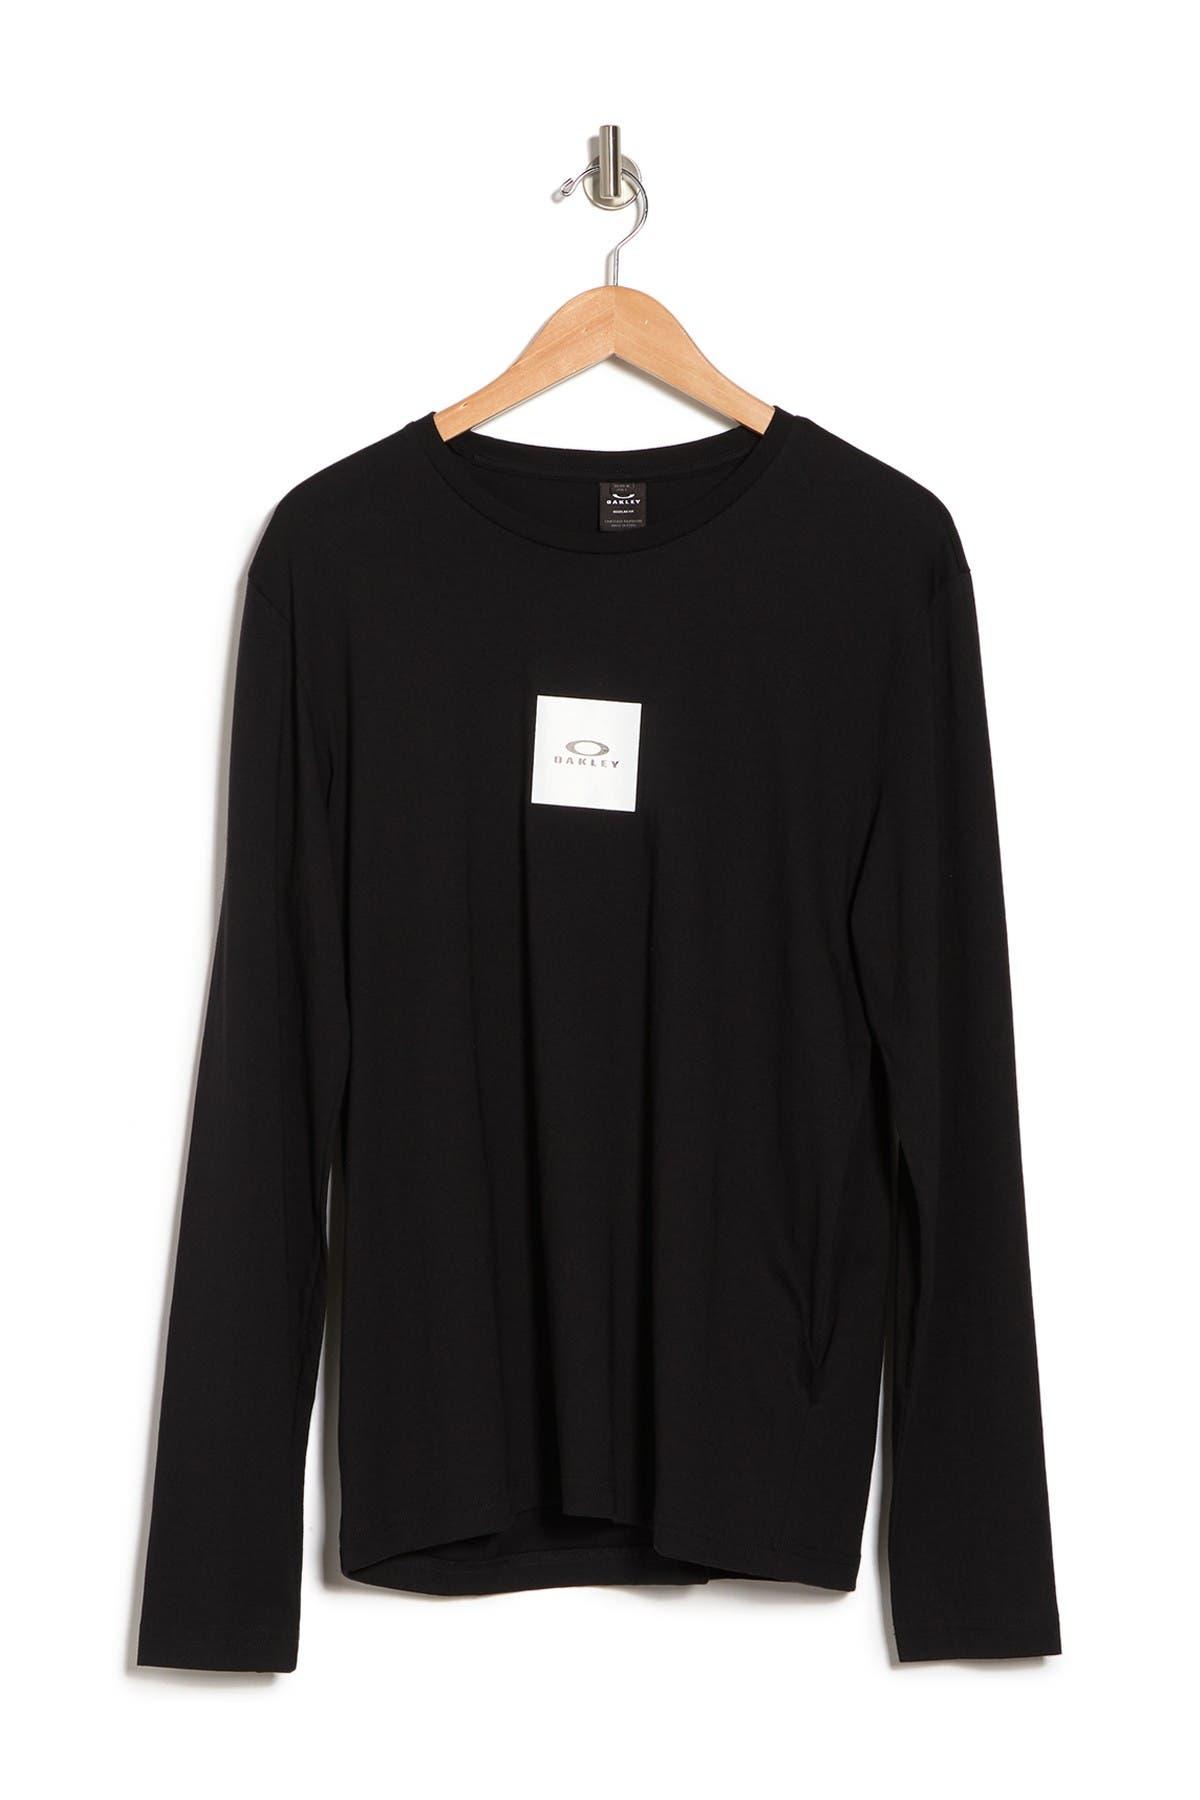 Image of Oakley Block Logo Long Sleeve T-Shirt